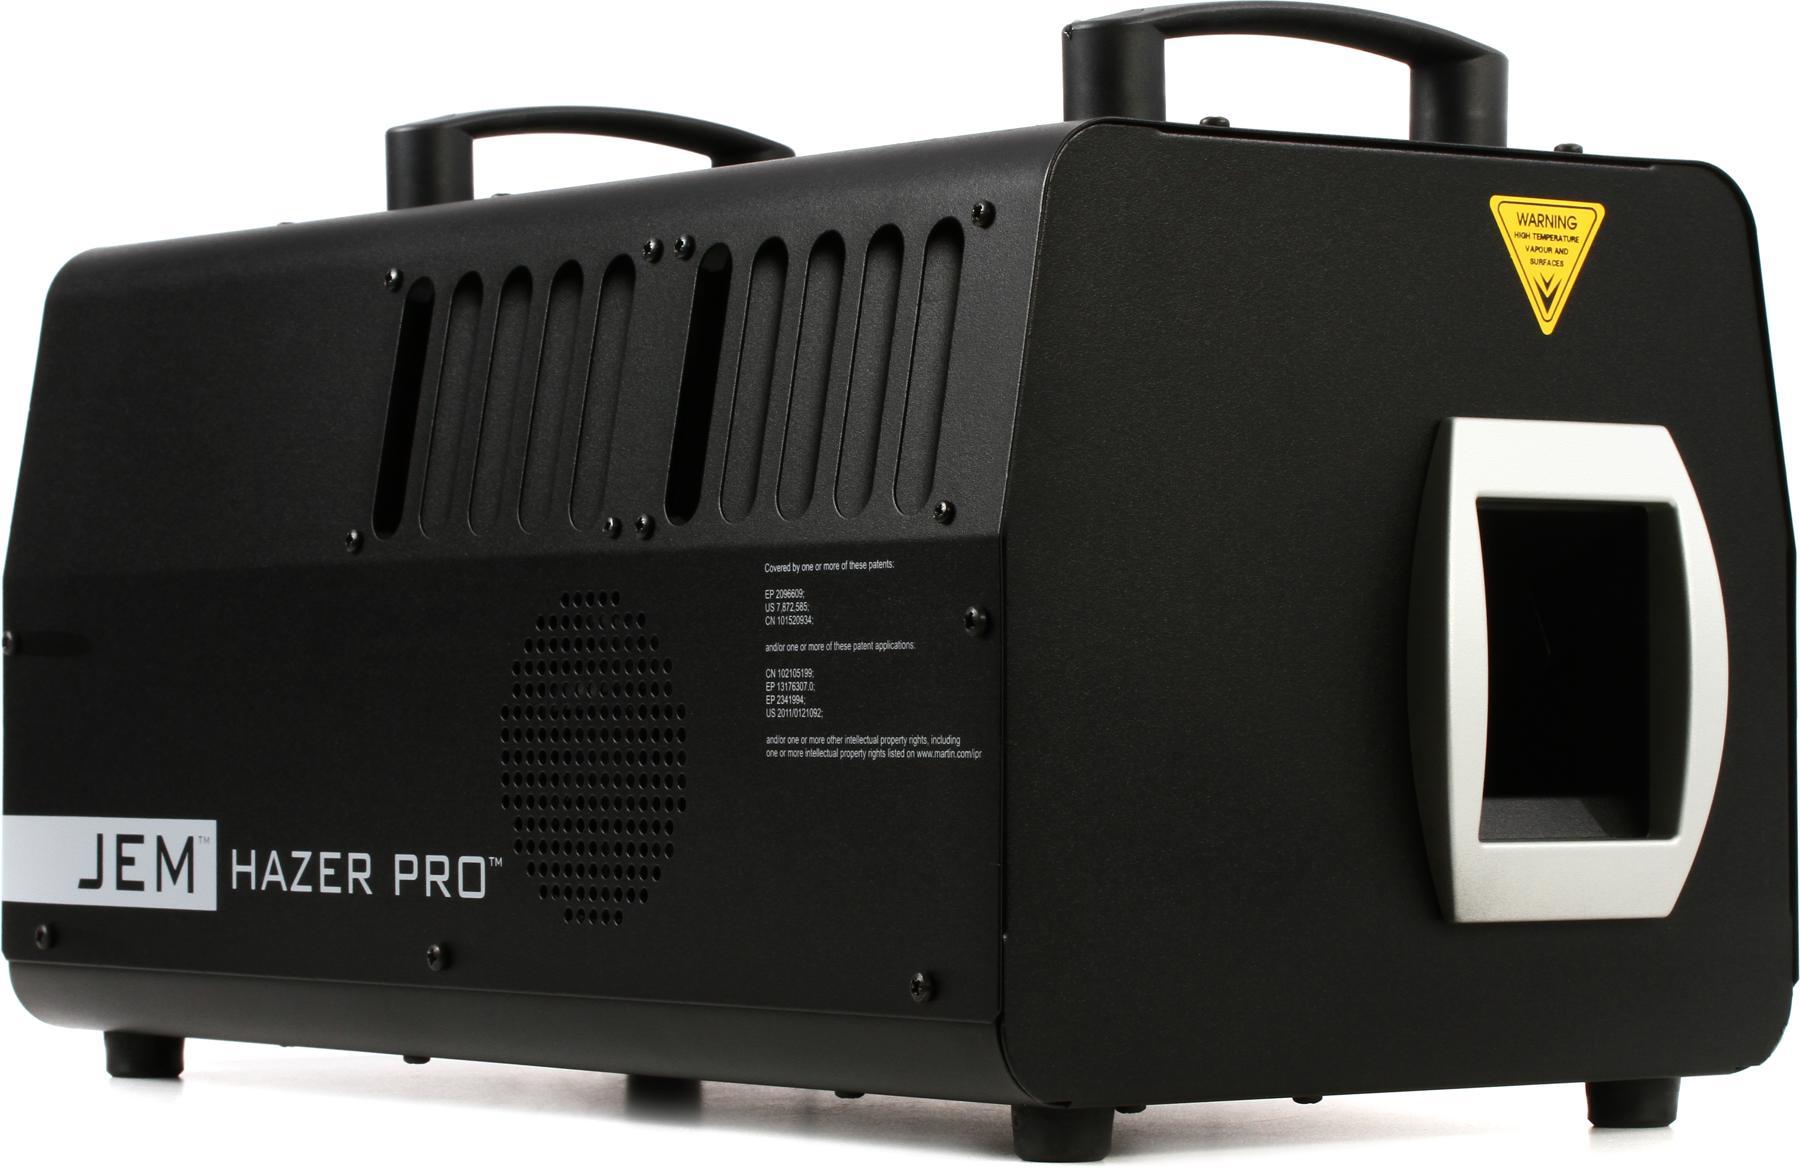 4. Martin Lighting JEM Hazer Pro